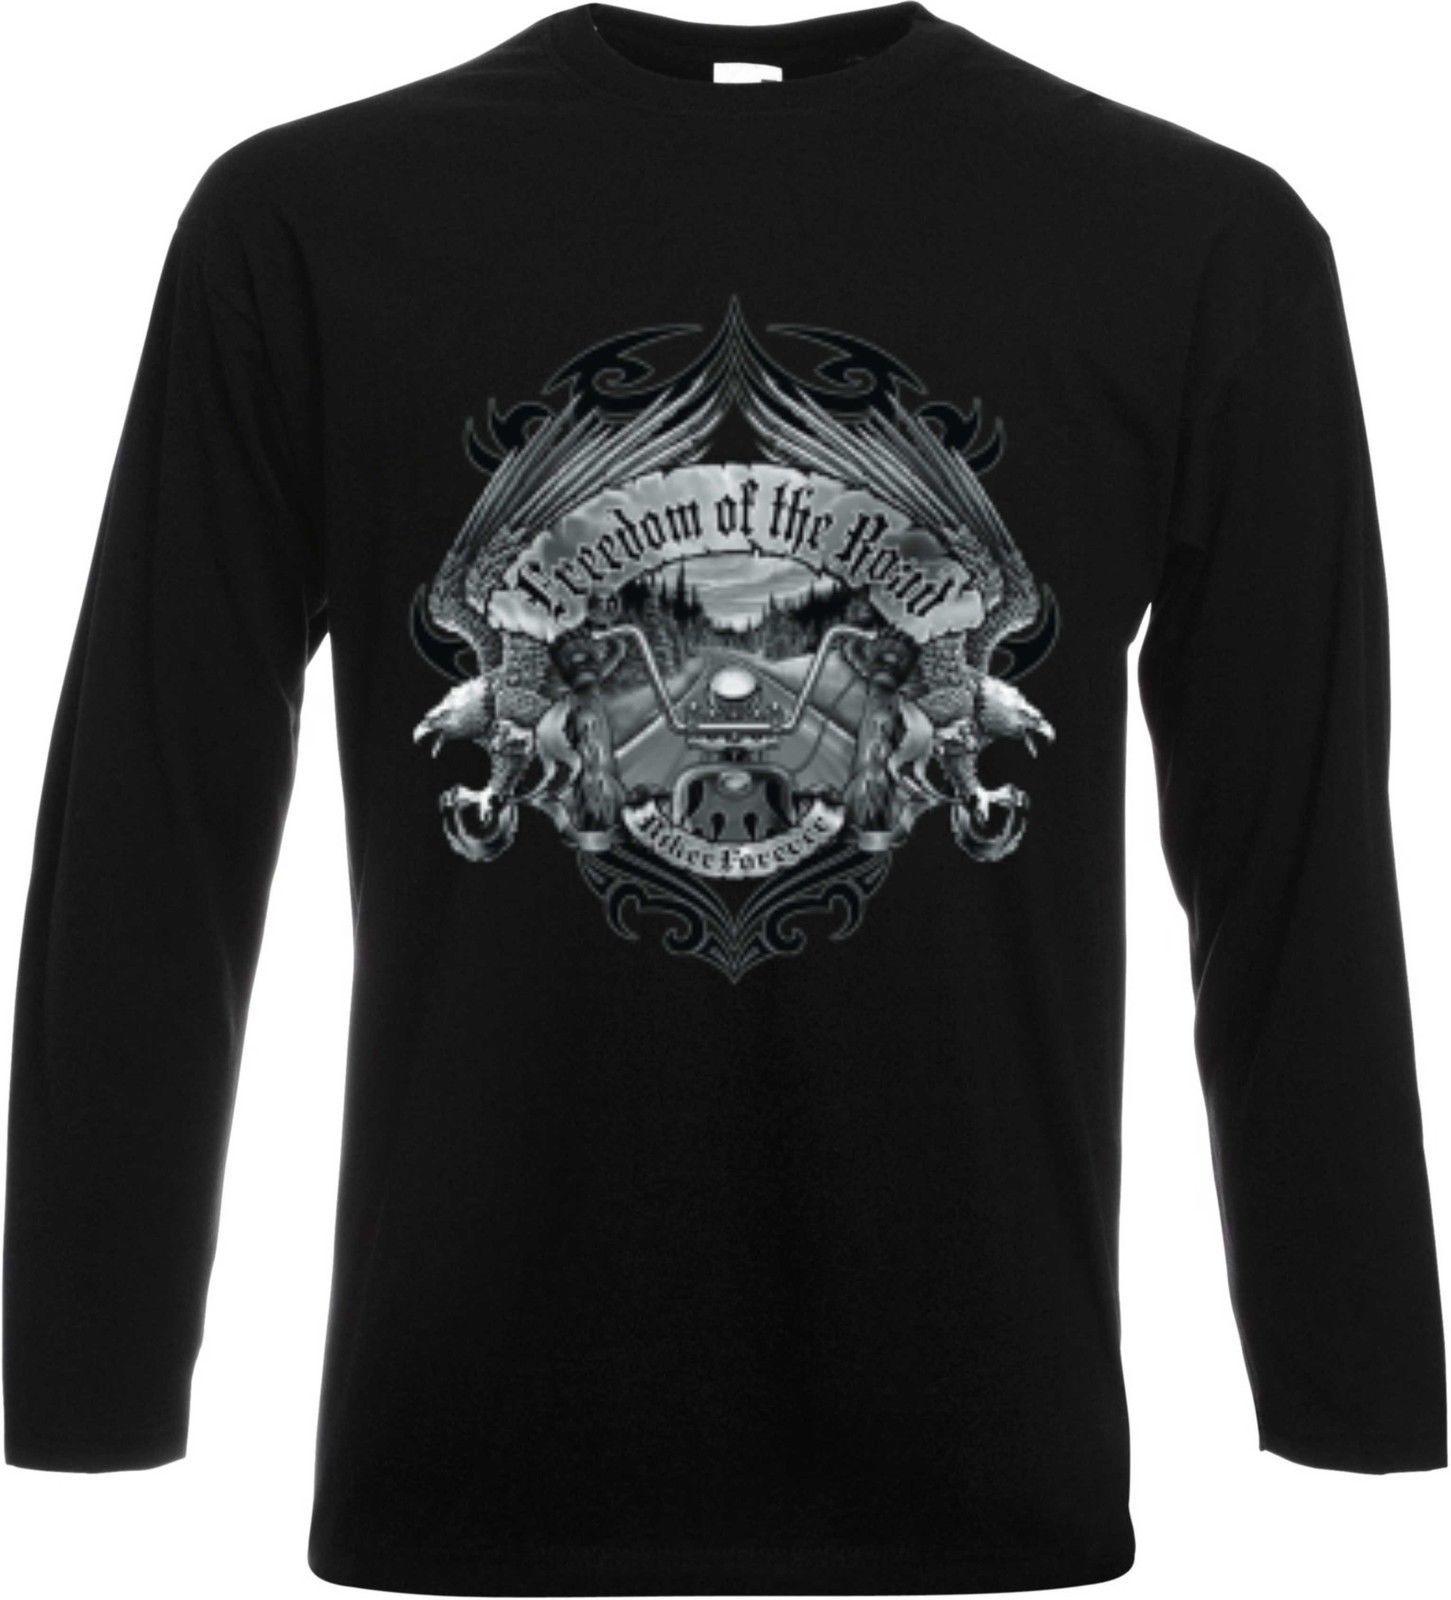 Long Sleeve//Long Sleeve Shirt Black Biker Chopper Hd/&vtwinmodell Freedom of the